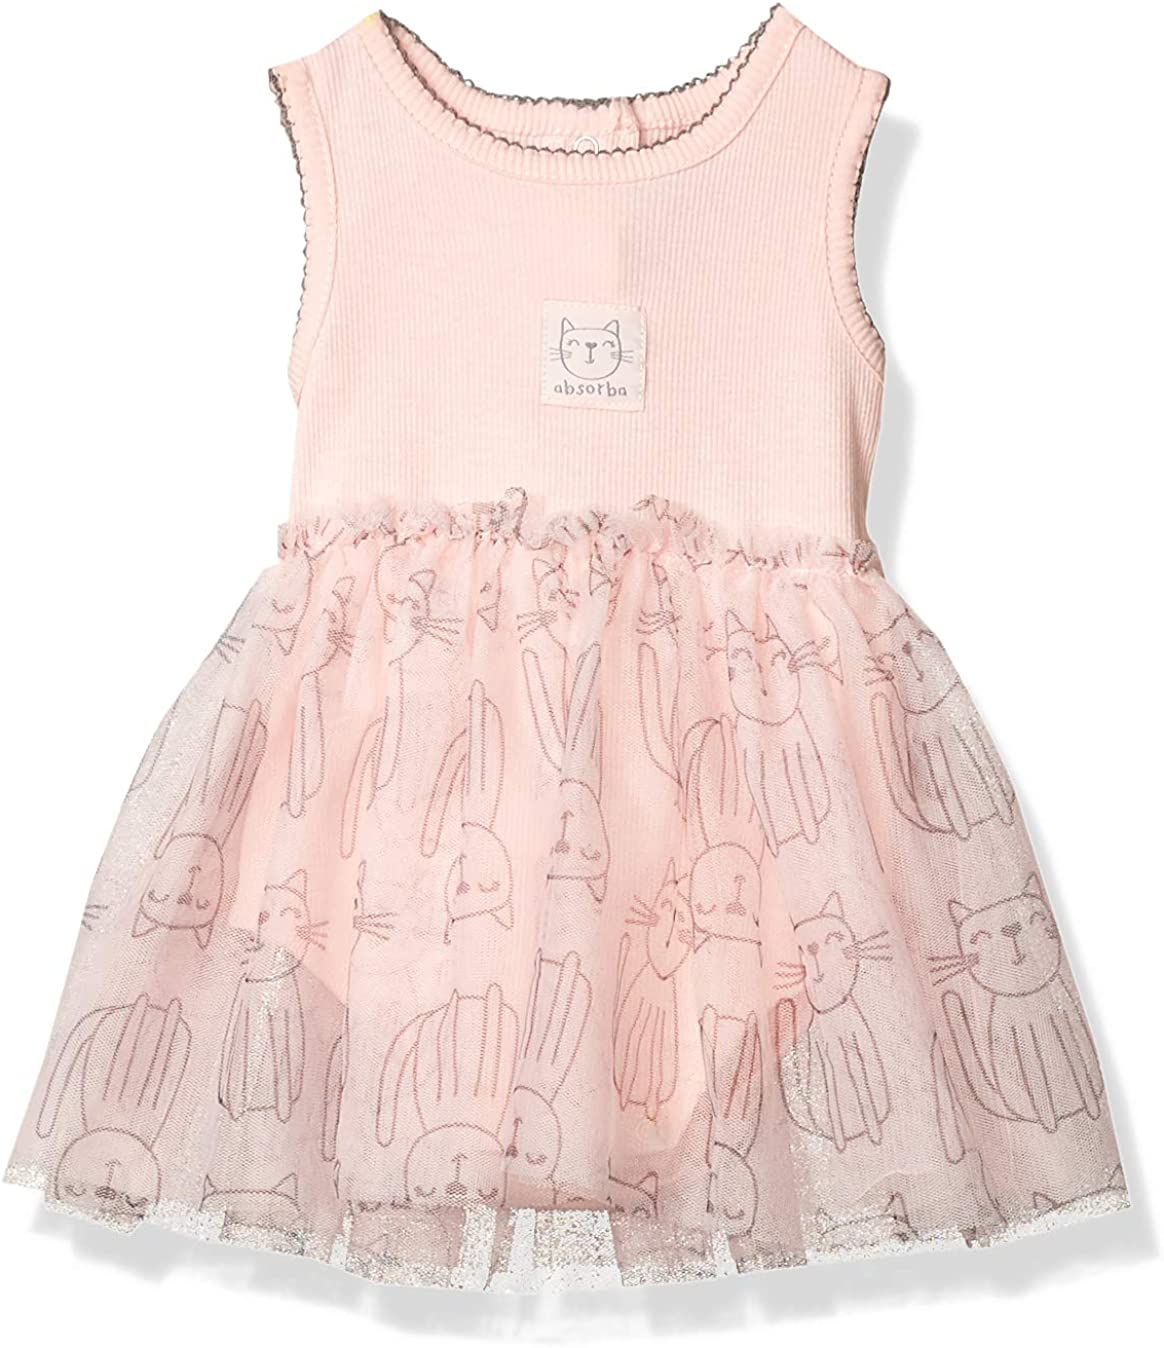 absorba Baby High order Girls' Dress Outlet SALE Sleeveless